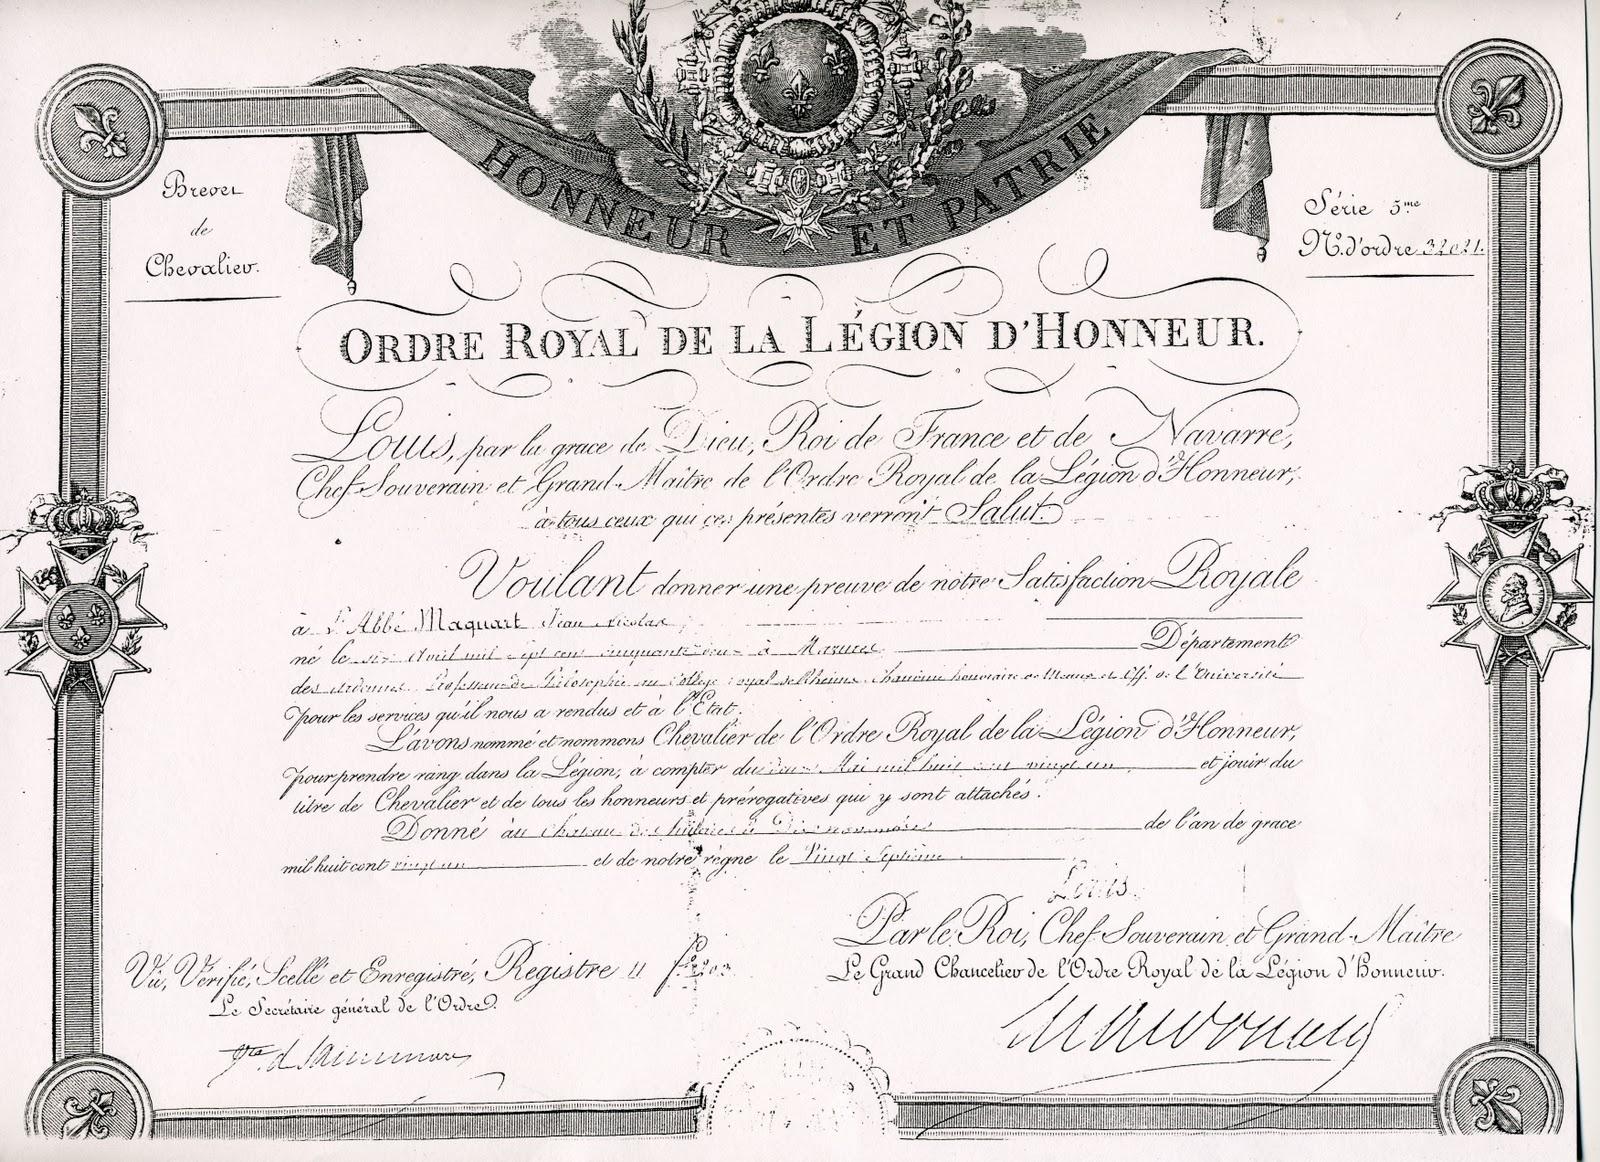 Napoleonic Documents and Manuscripts